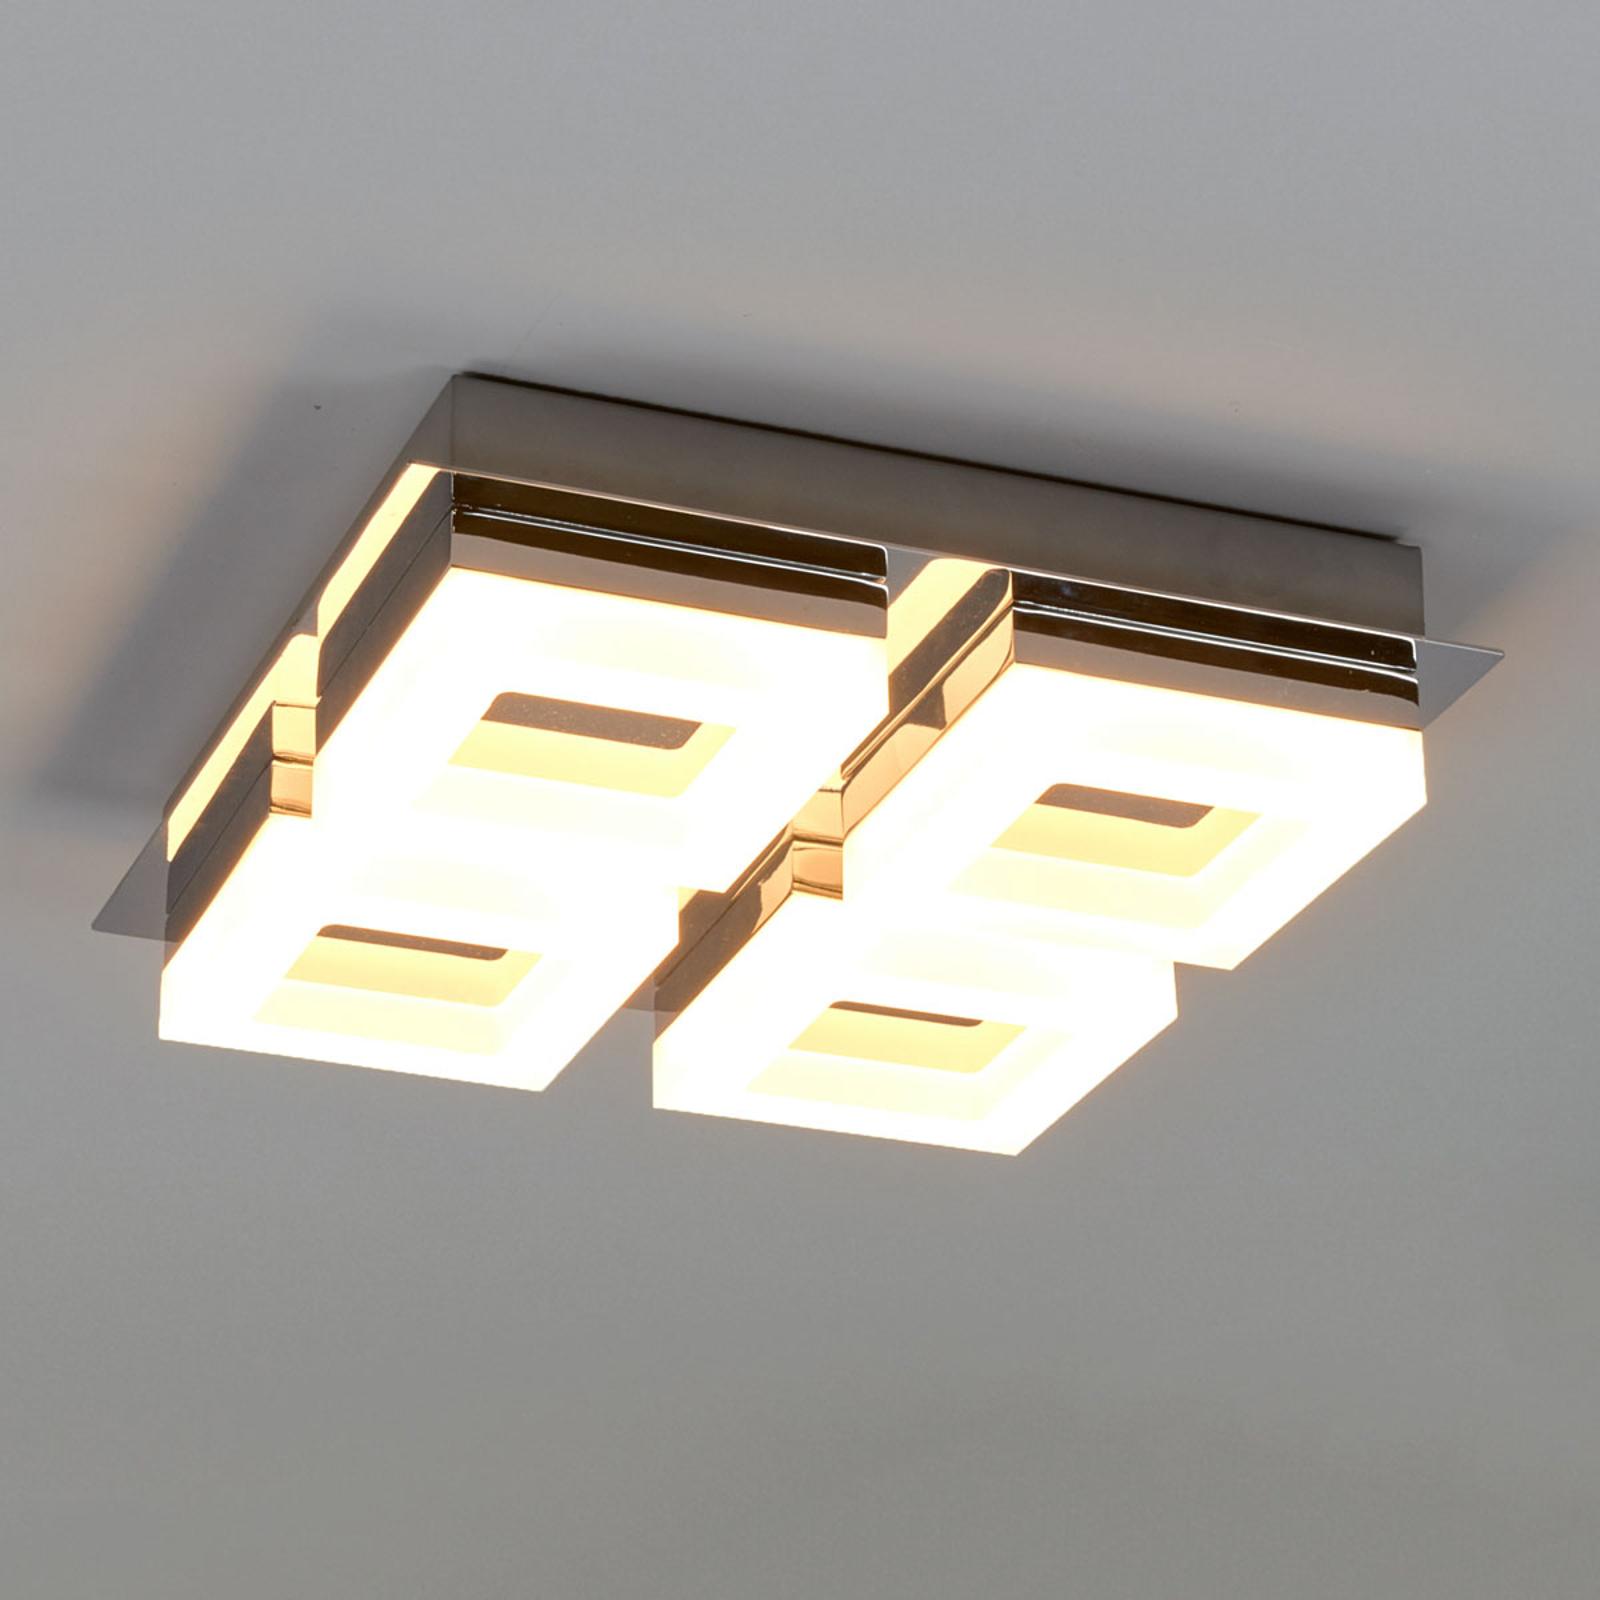 Vierflammige LED-Bad-Deckenleuchte Marija